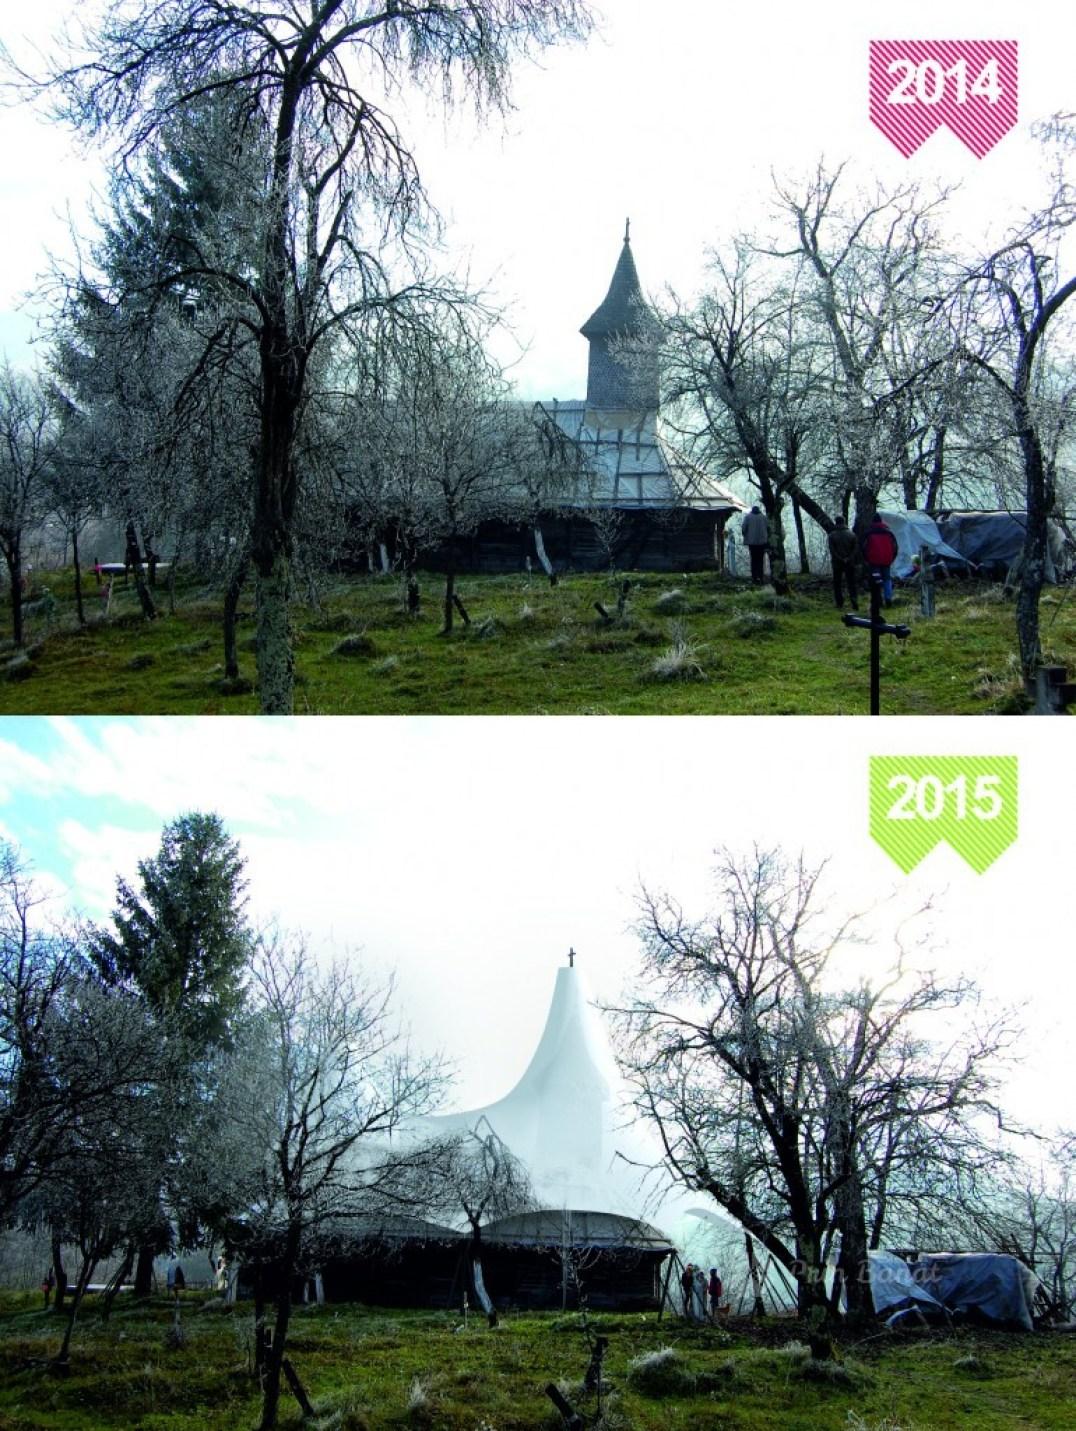 Biserica din Crivina de Sus (2014 vs. 2015)/ Sursă foto: www.cimitiredinbant.ro